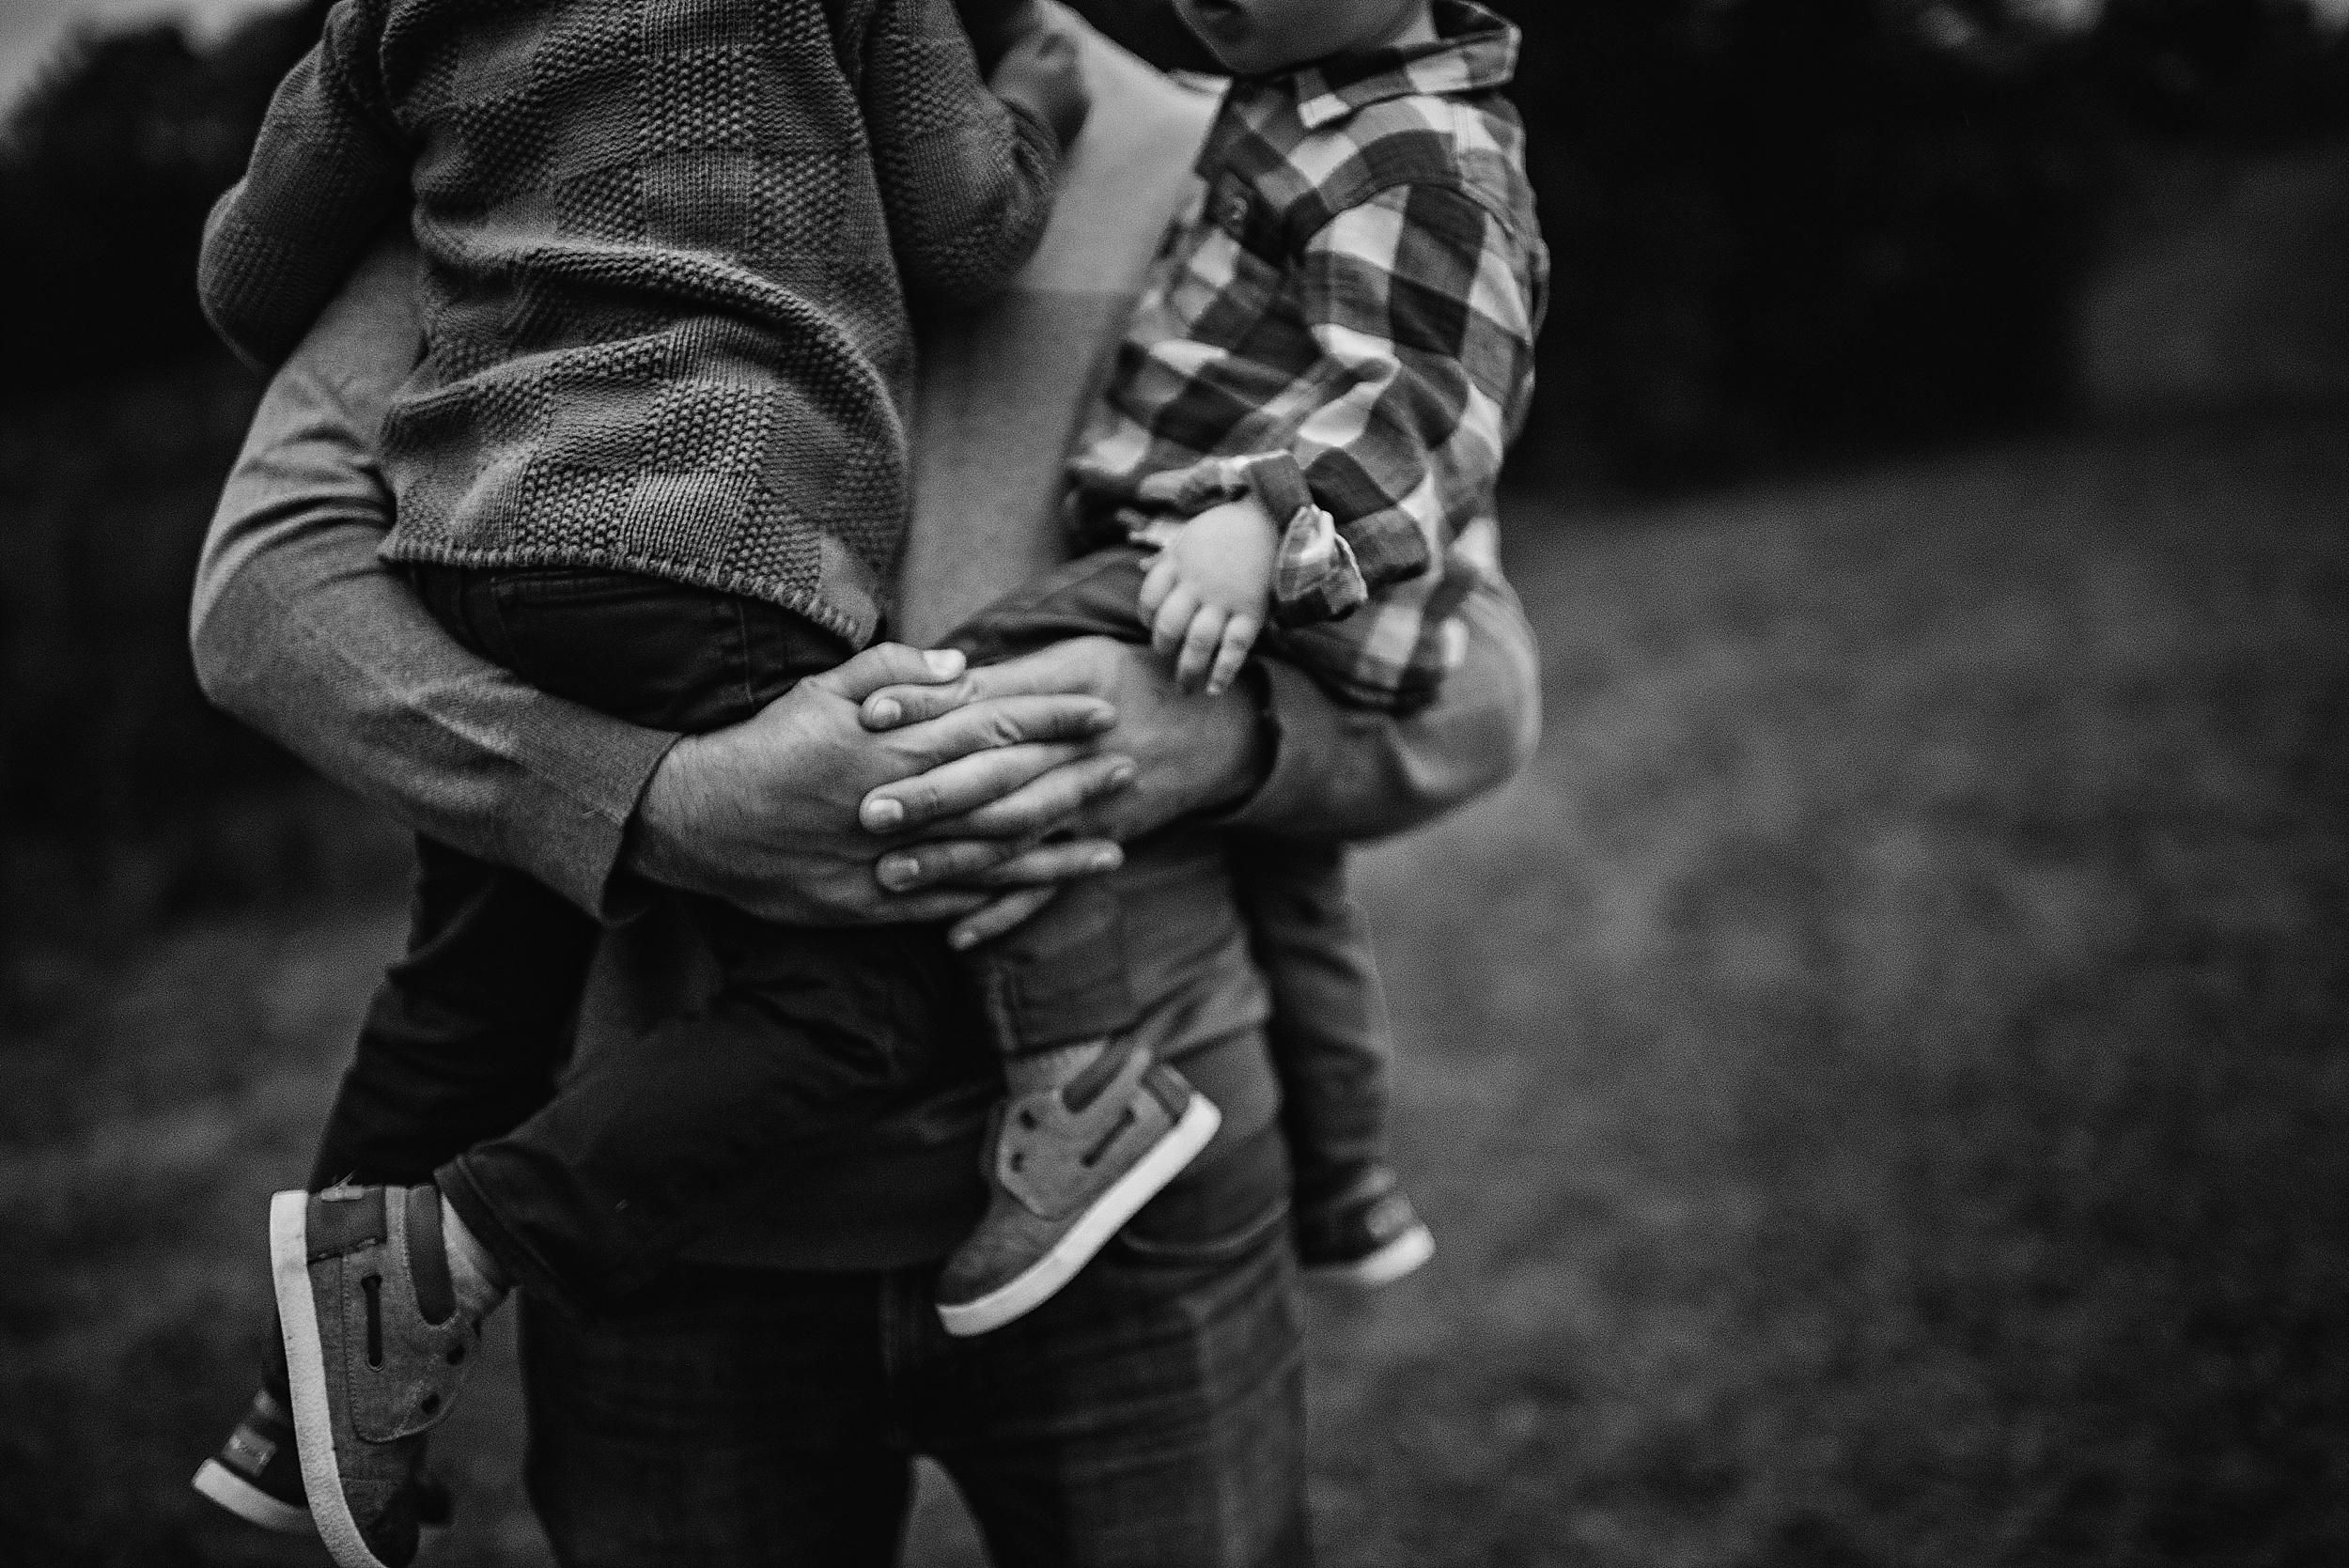 lauren-grayson-photography-portrait-artist-akron-cleveland-ohio-photographer-family-session-fields-sunset-fall_0218.jpg